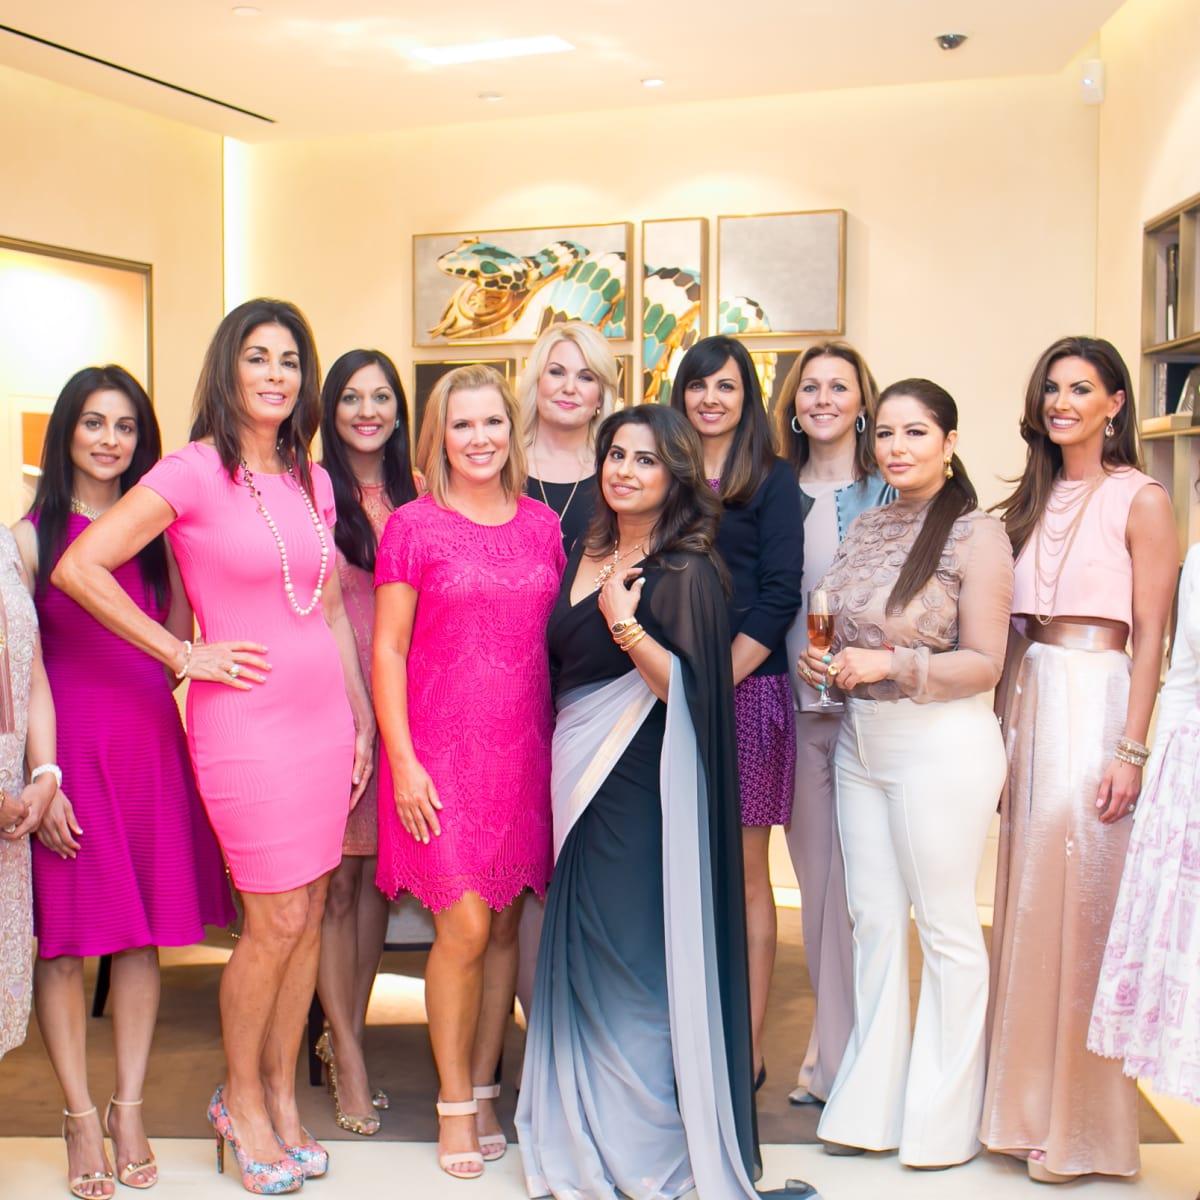 International Mothers' Day at Bulgari, honorees